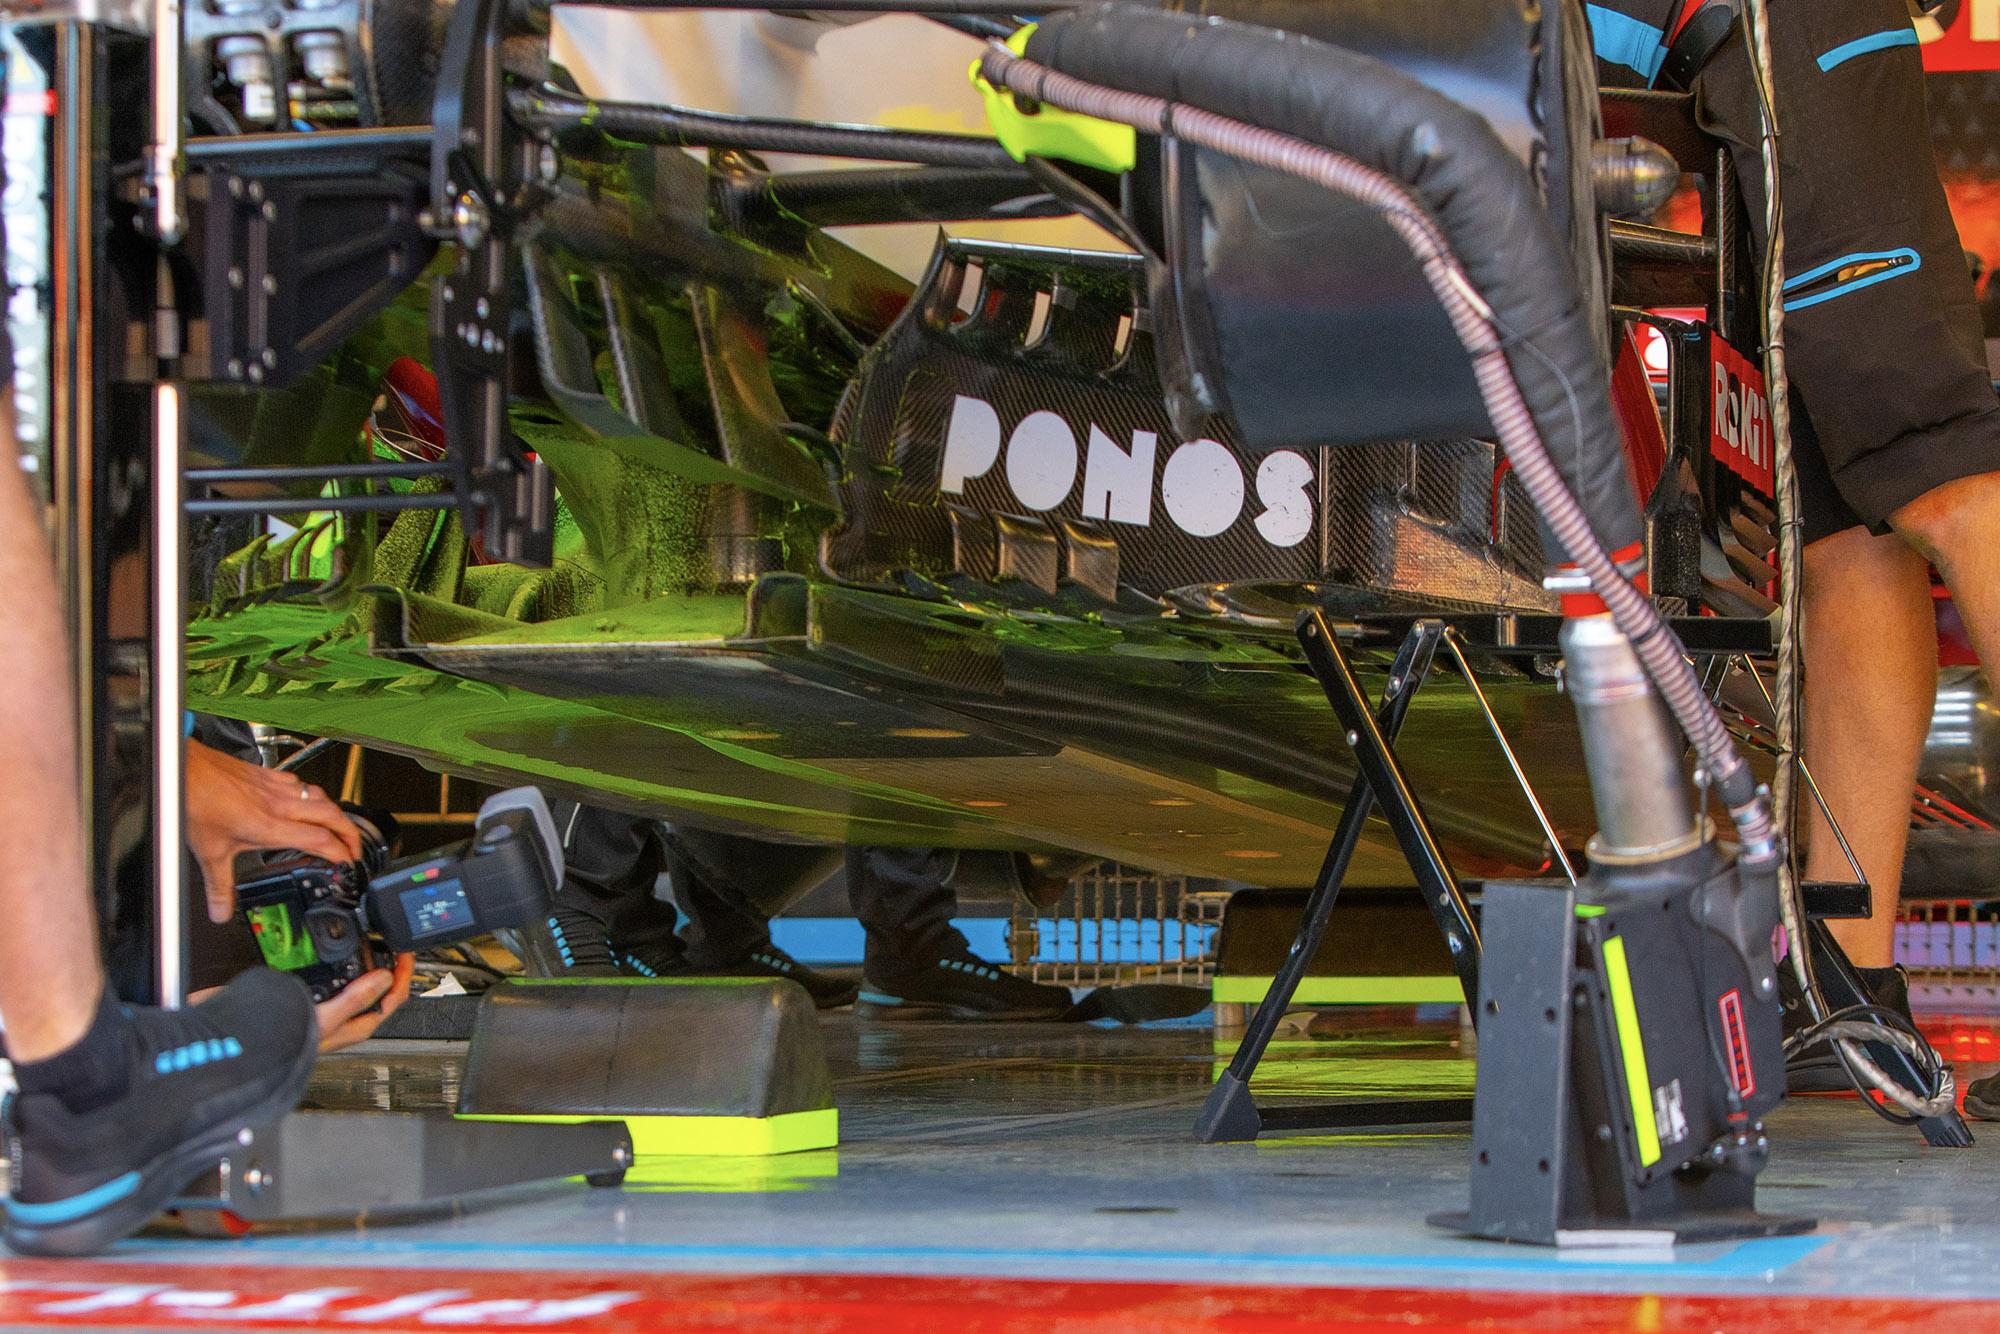 Flow-viz paint on the floor of the Williams during 2020 F1 preseason testing